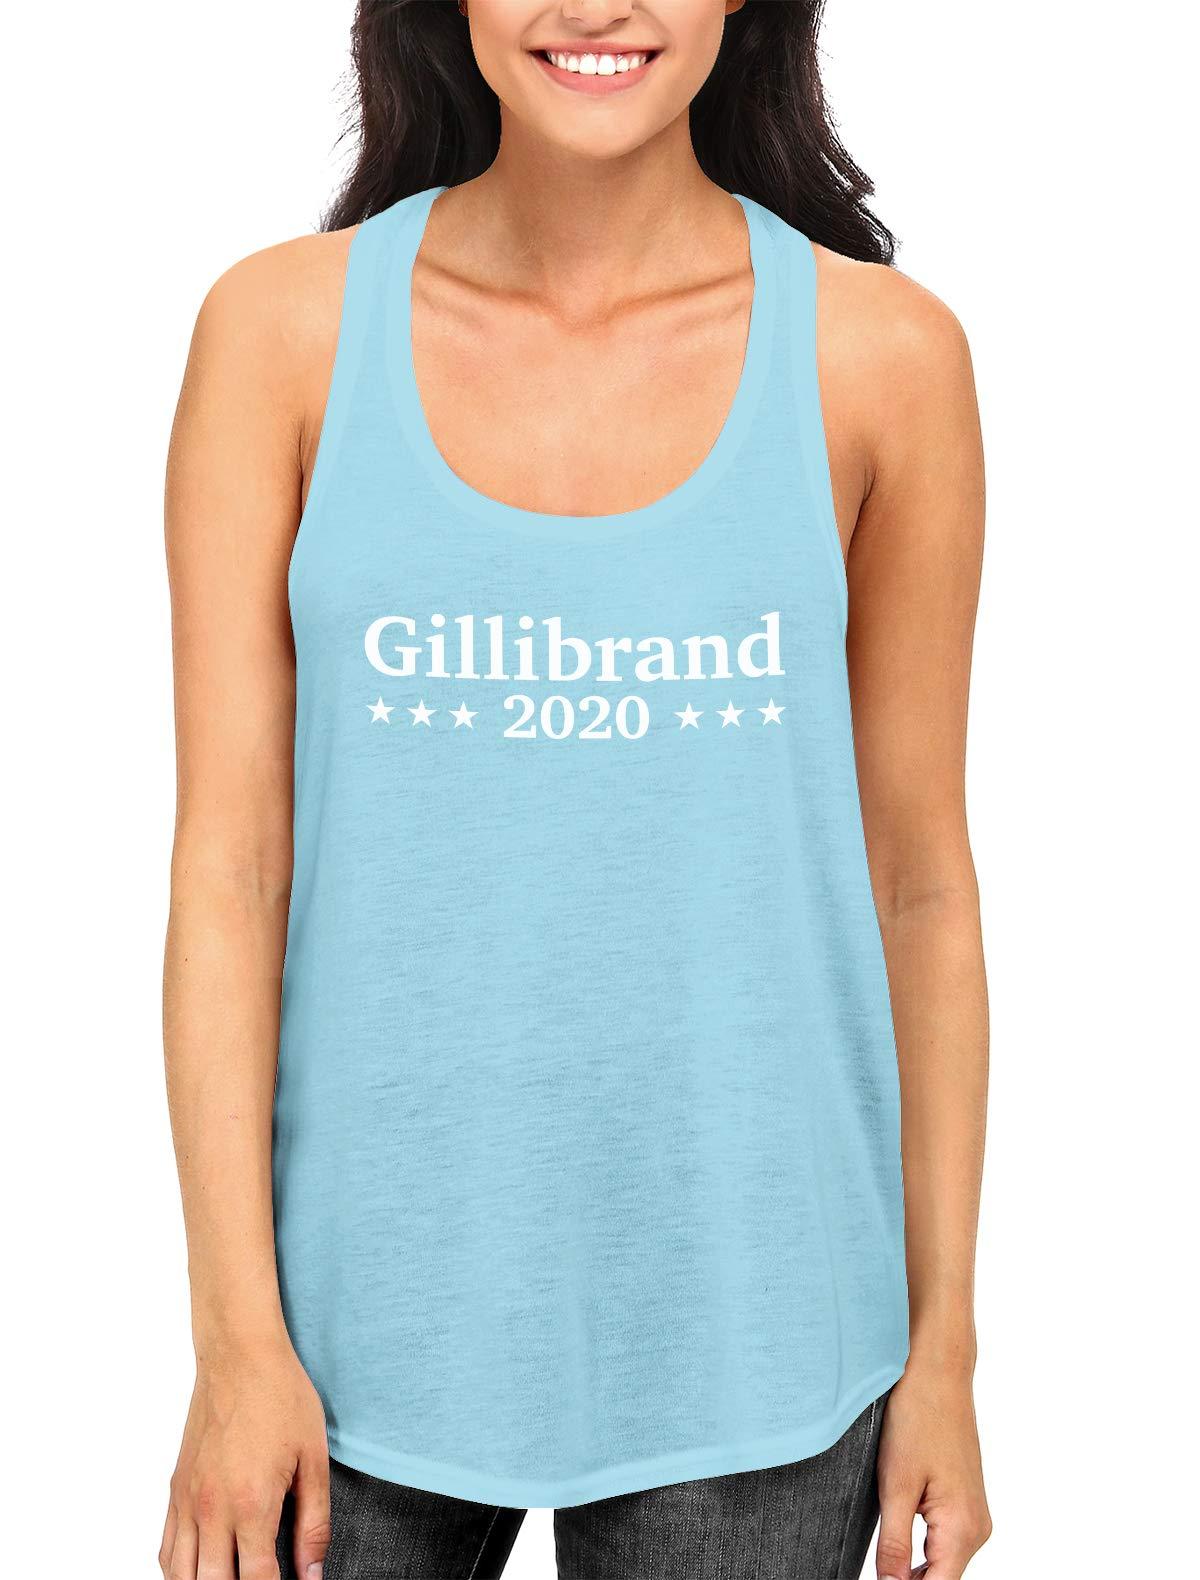 Apparel Kirsten Gillibrand 2020 Presidential Candidate Racerback Tank Top 4257 Shirts